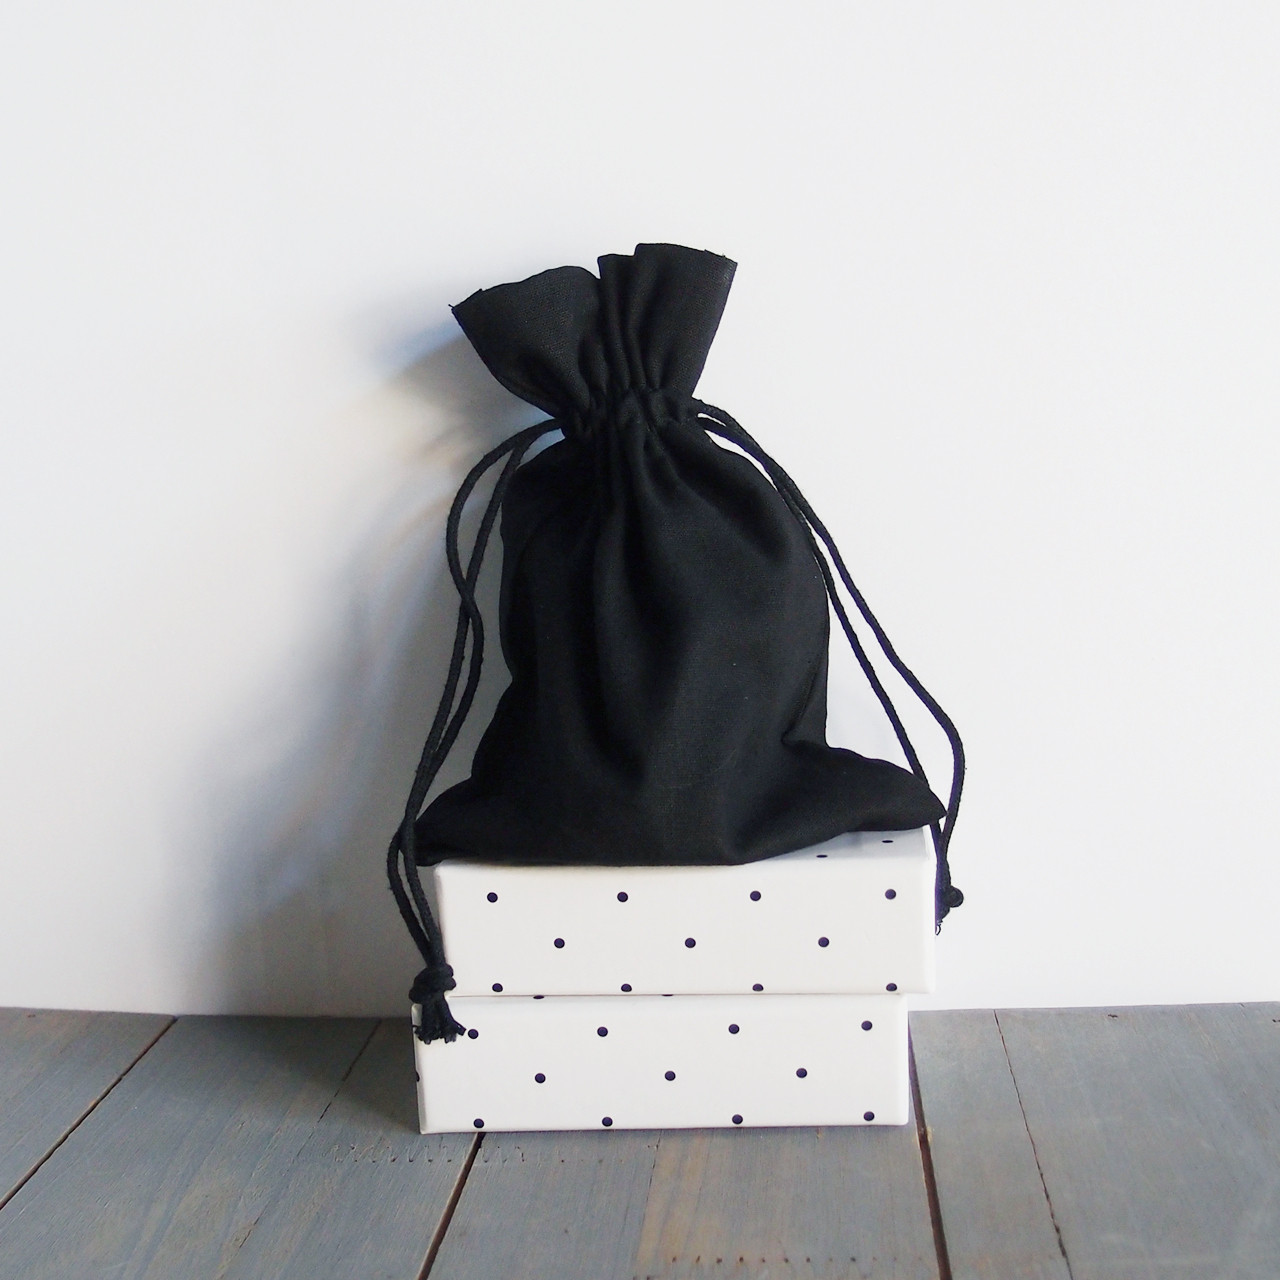 Black Cotton Drawstring Bags 5 x 7 inches, Wholesale Black Drawstring Bags | Packaging Decor